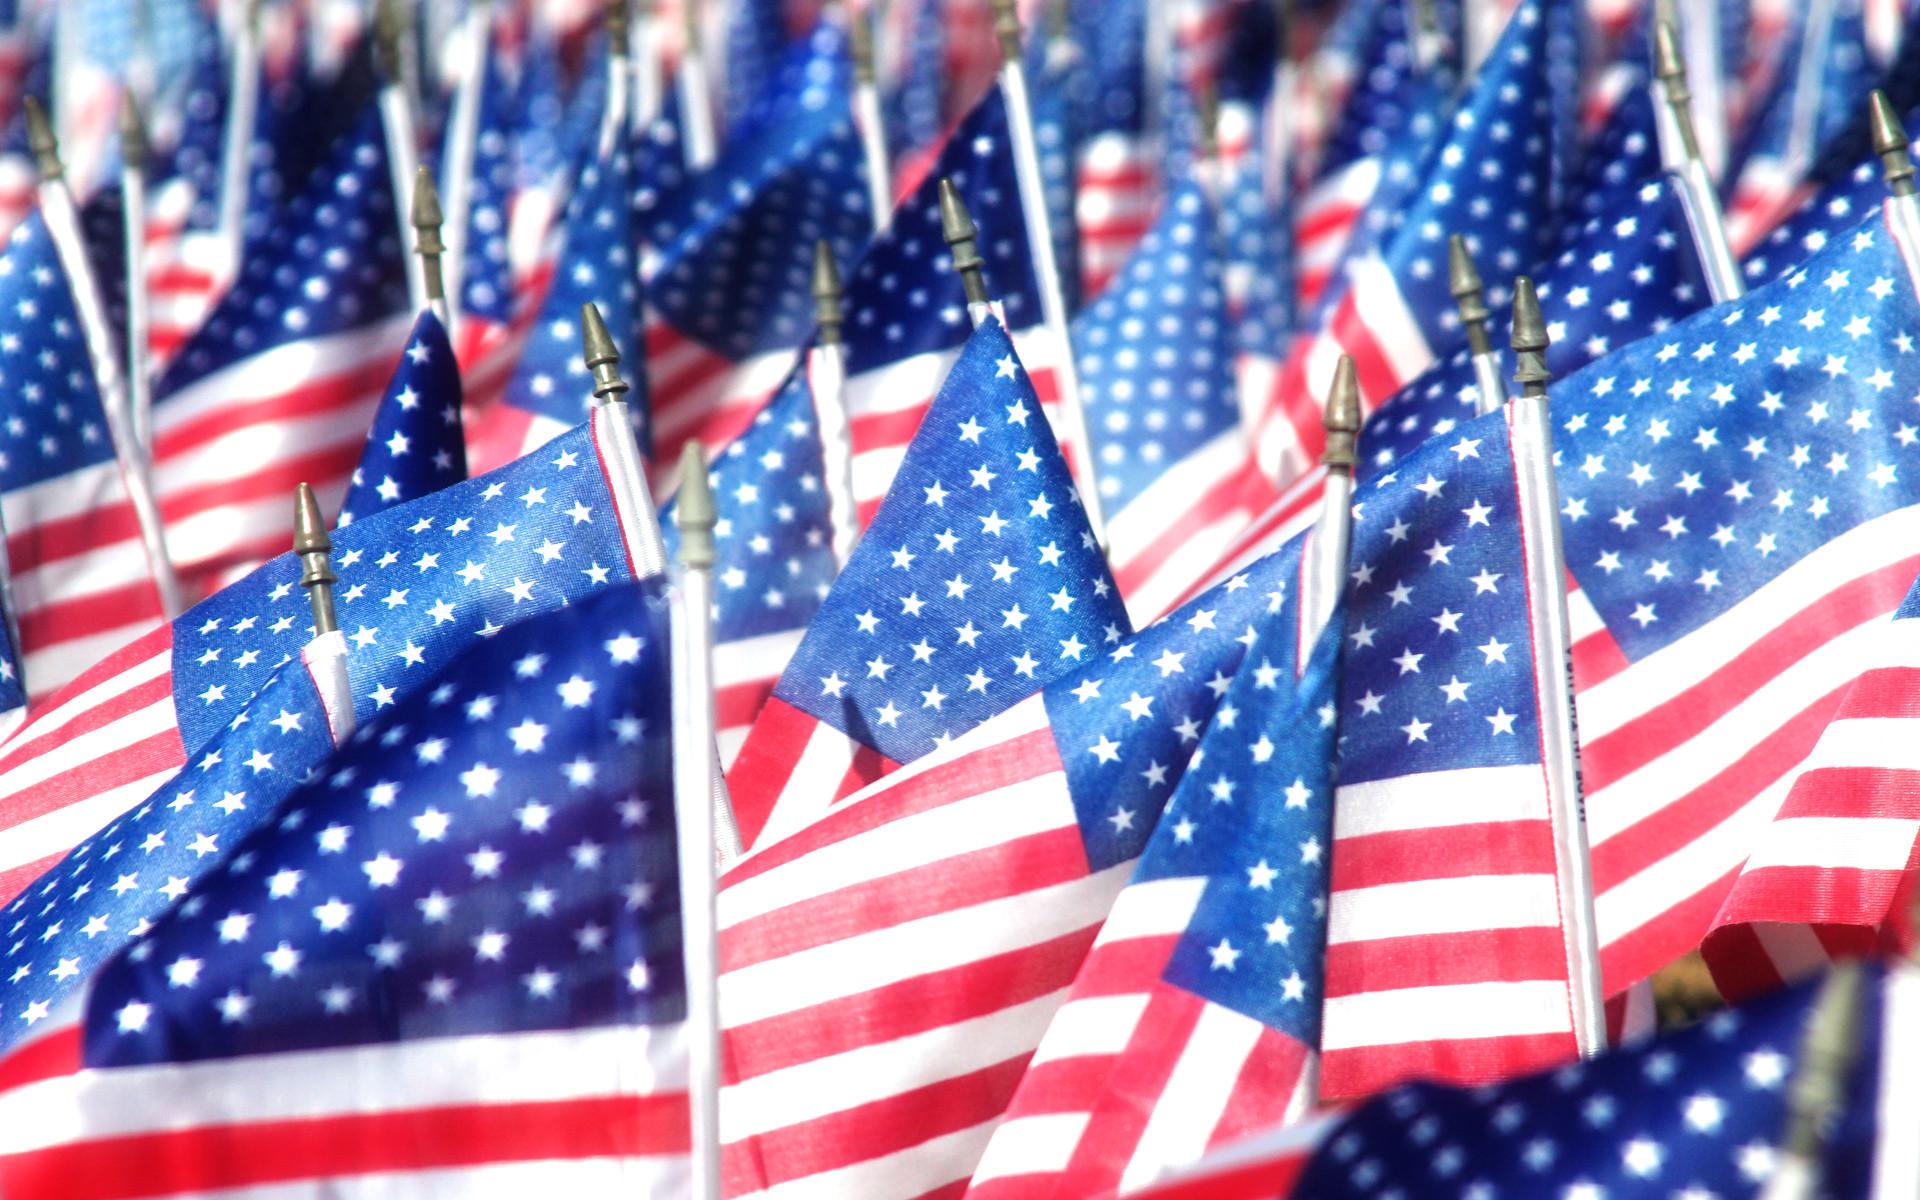 Veterans Day Screensavers